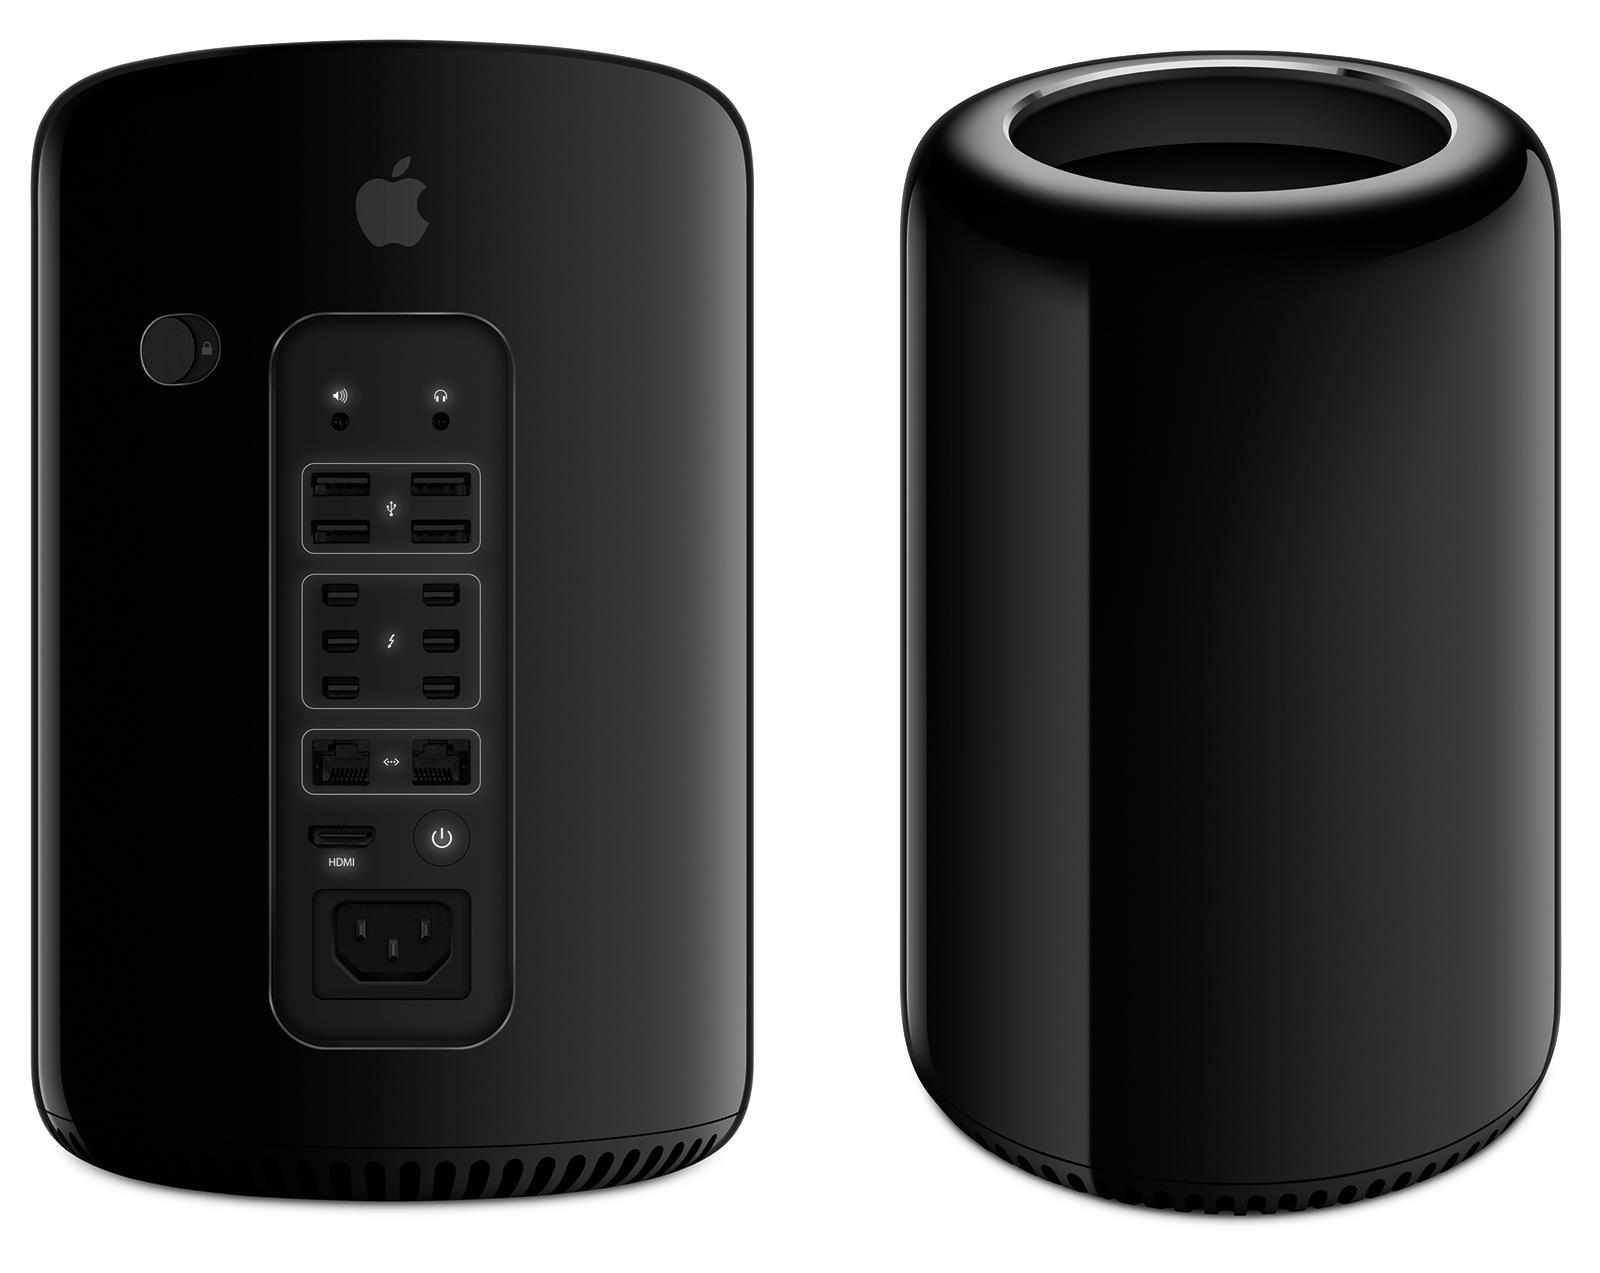 Apple Mac Pro Desktop Computer (Eight-Core, Late 2013)  |Apple Mac Computer 2013